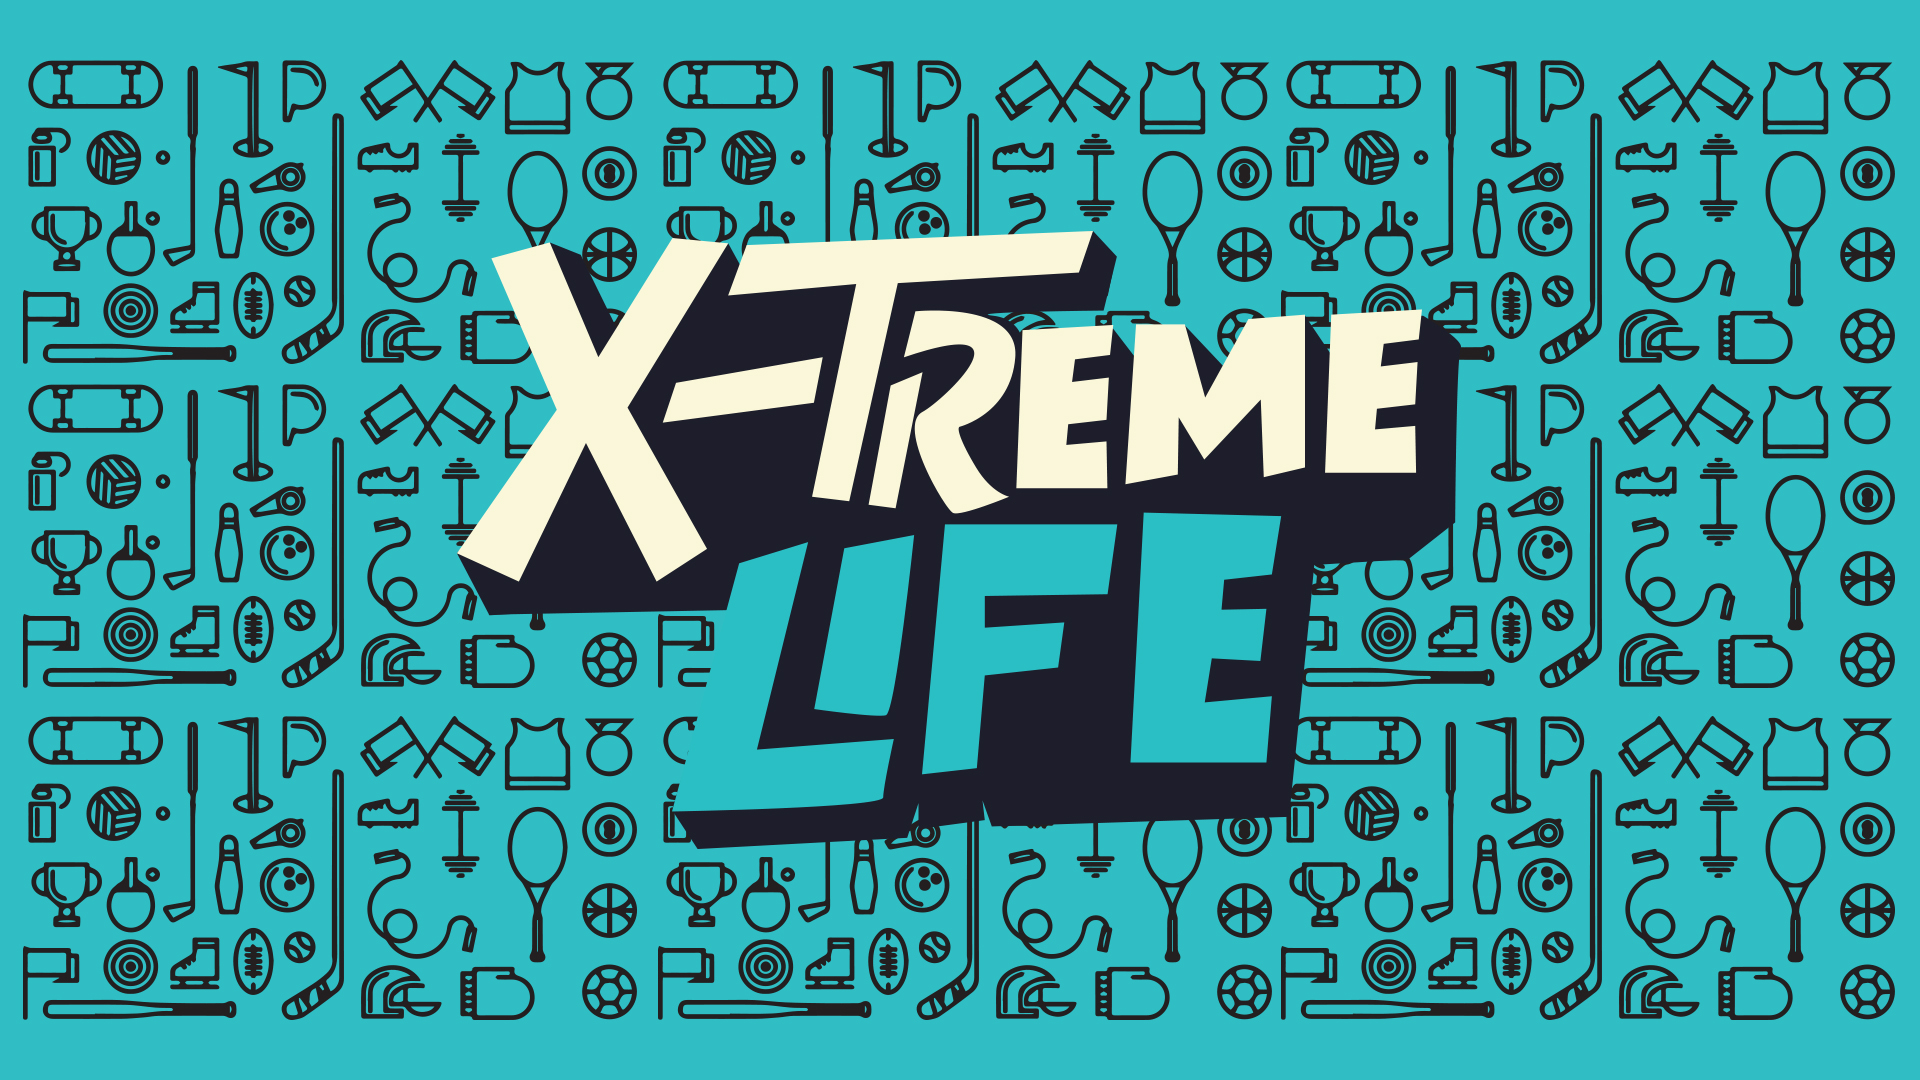 XtremeLifeBCKGRND.jpg